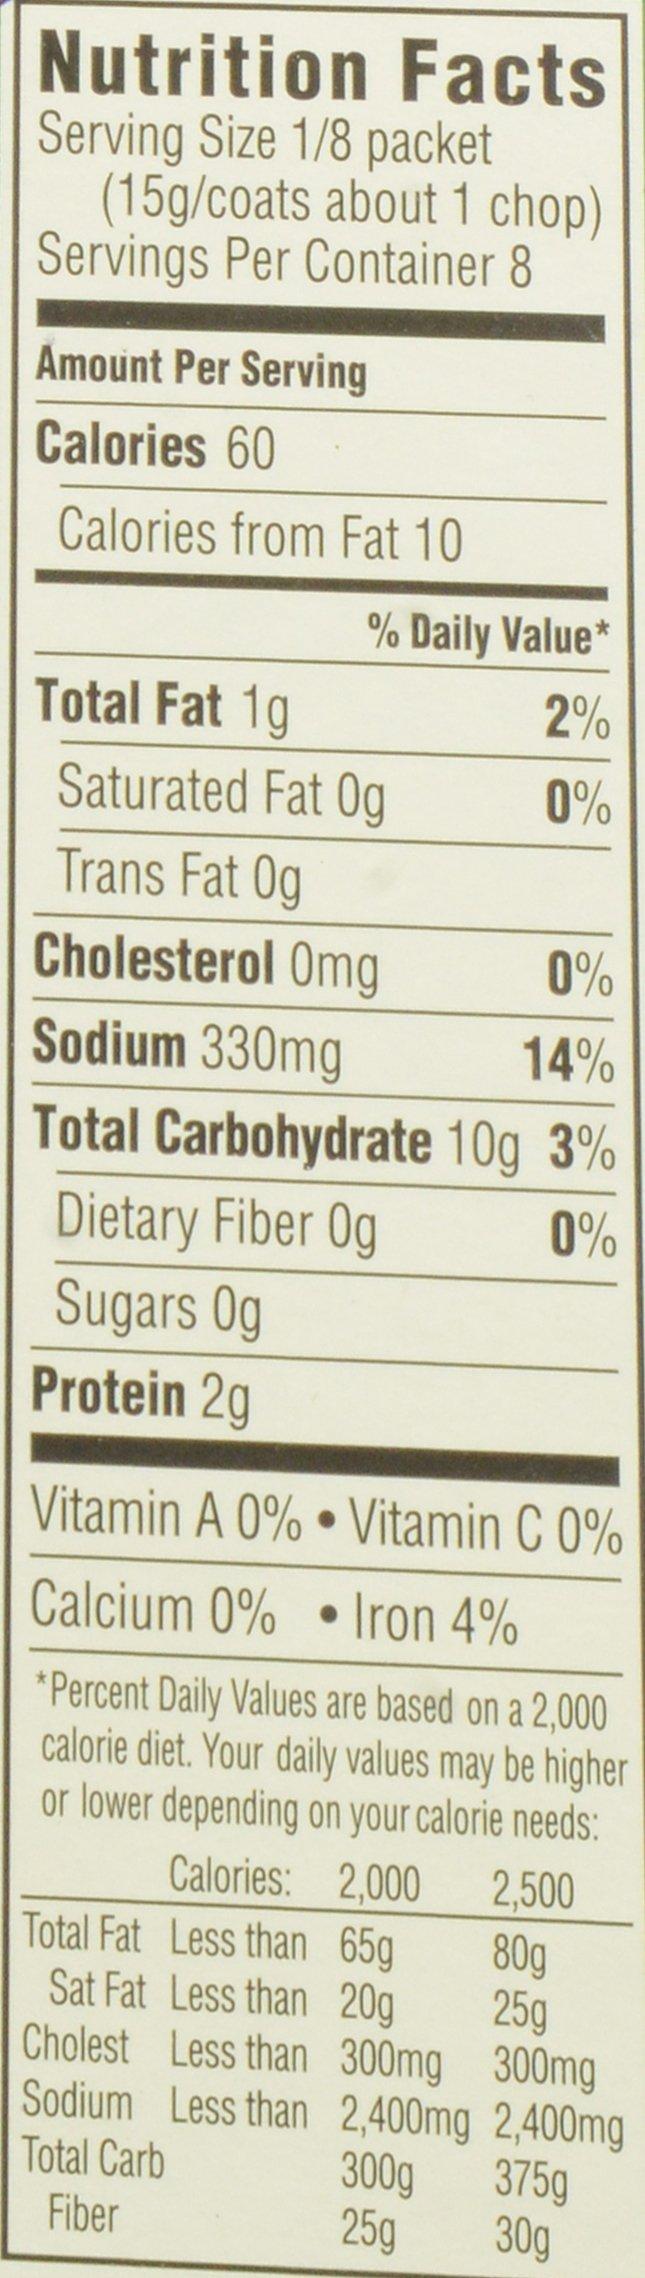 Kraft Oven Fry Seasoned Coating Mix for Pork, Extra Crispy, 4.2 oz(pack of 8) by Kraft Oven Fry (Image #2)